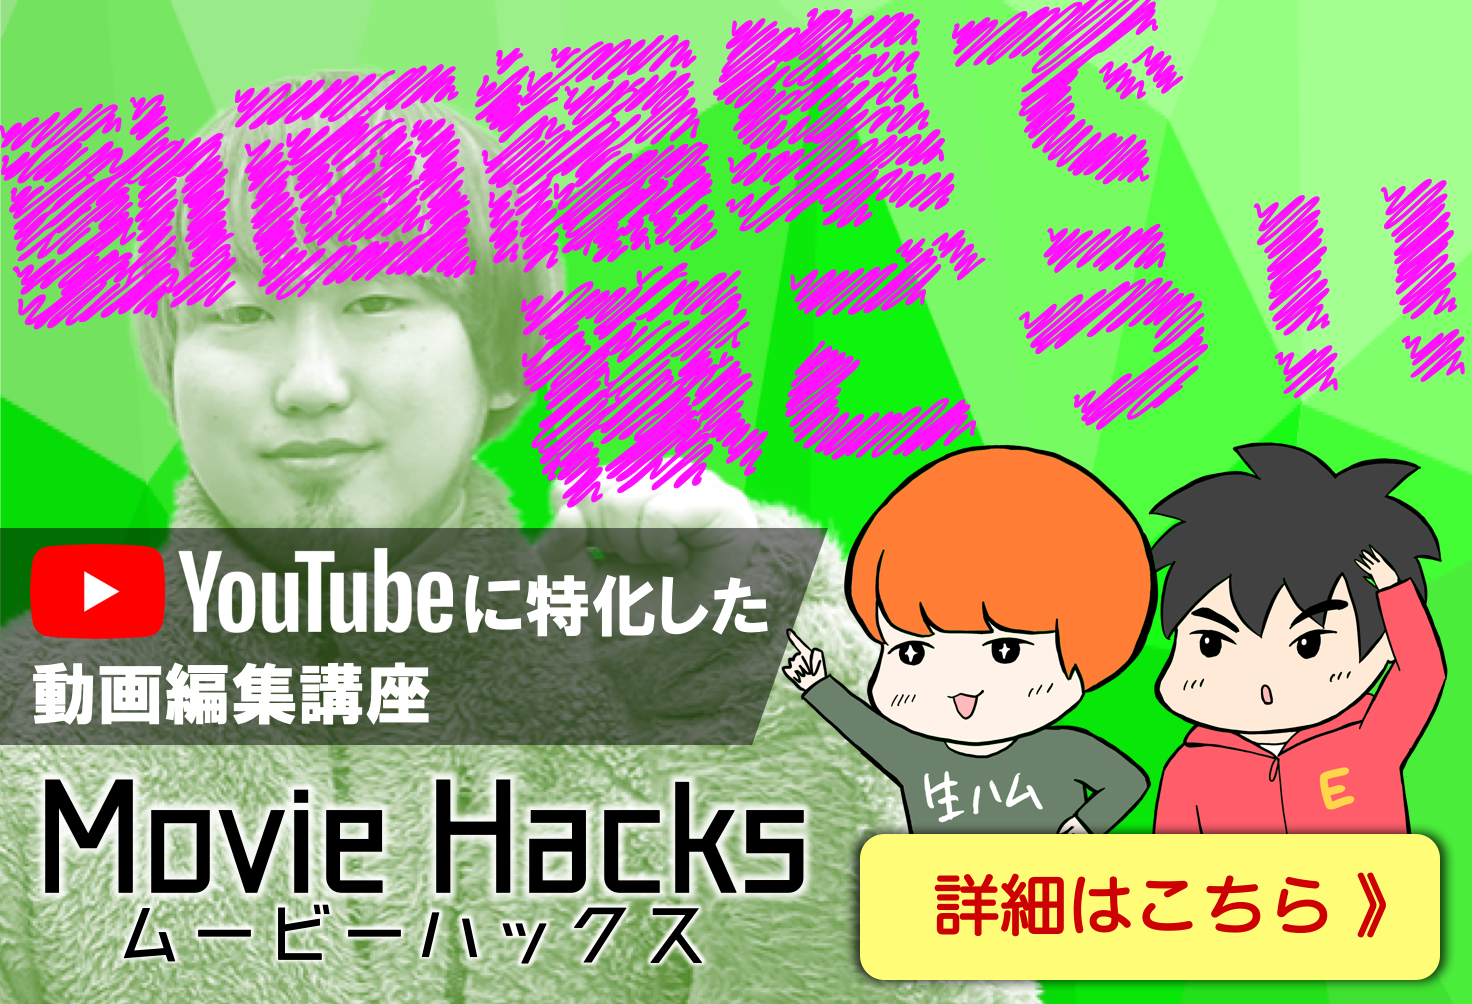 MovieHacks誘導バナー